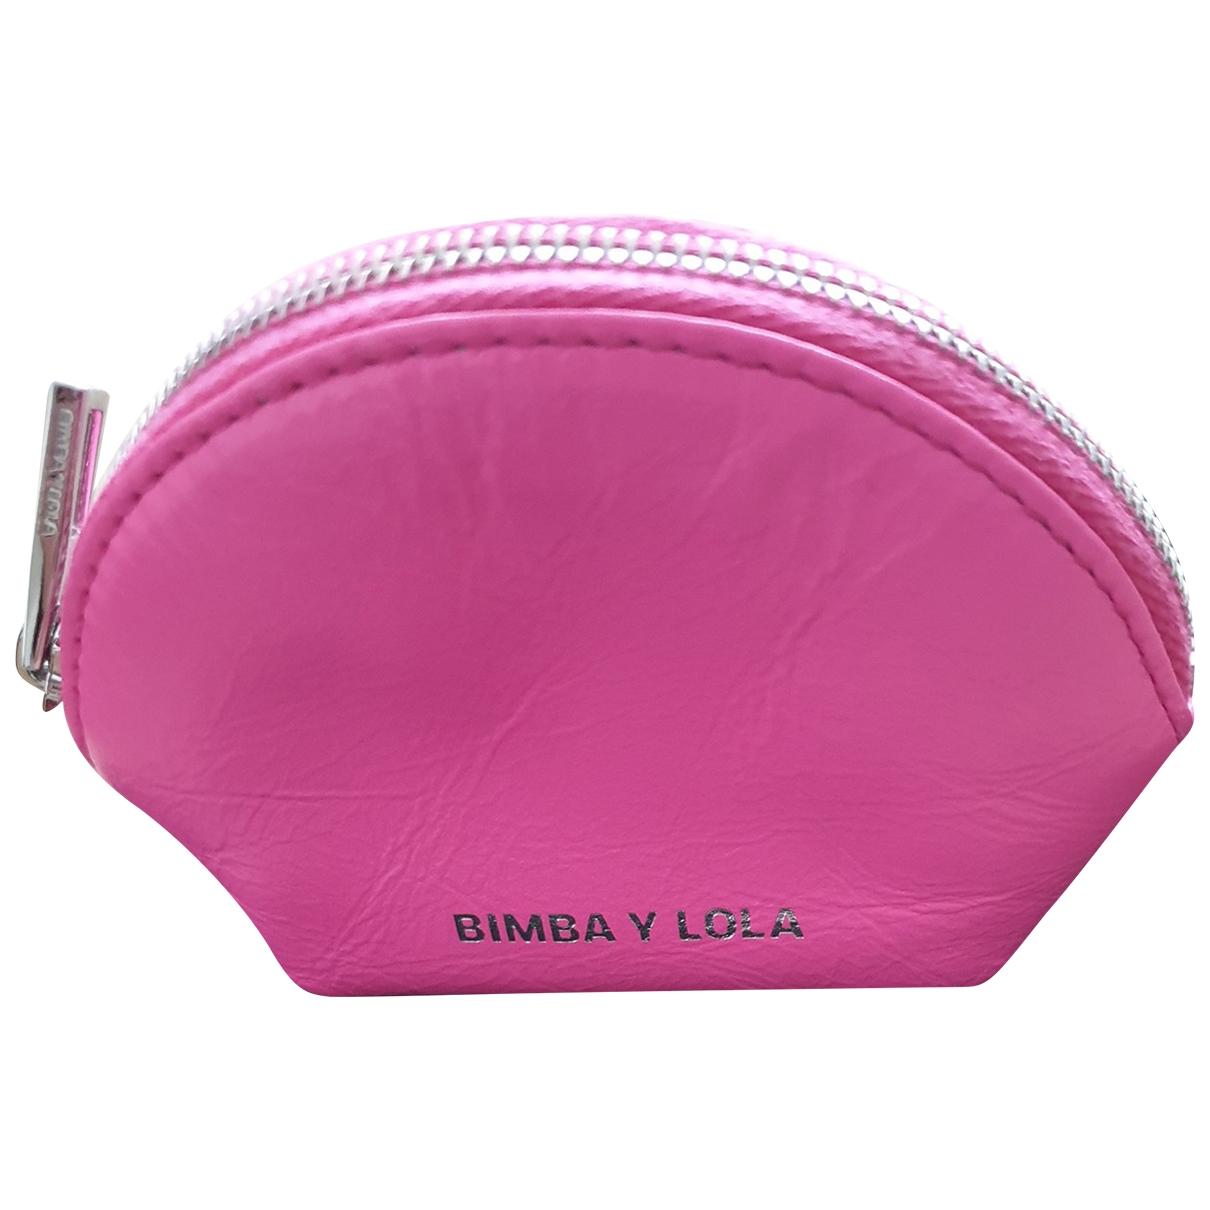 Bimba Y Lola - Petite maroquinerie   pour femme en cuir - rose